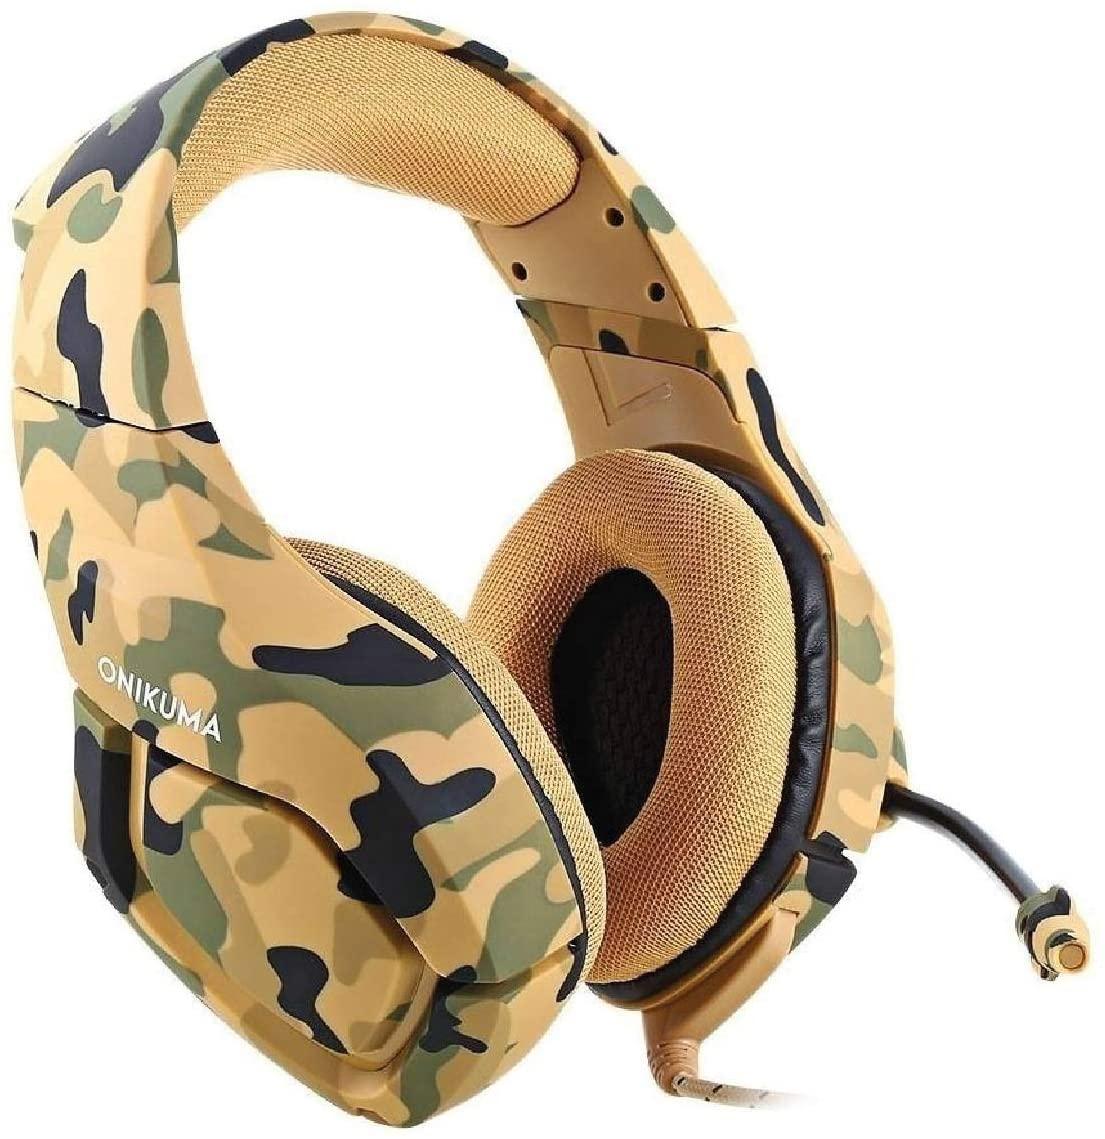 Fone Headset Gamer Profissional K18 Camuflagem Exército - Onikuma